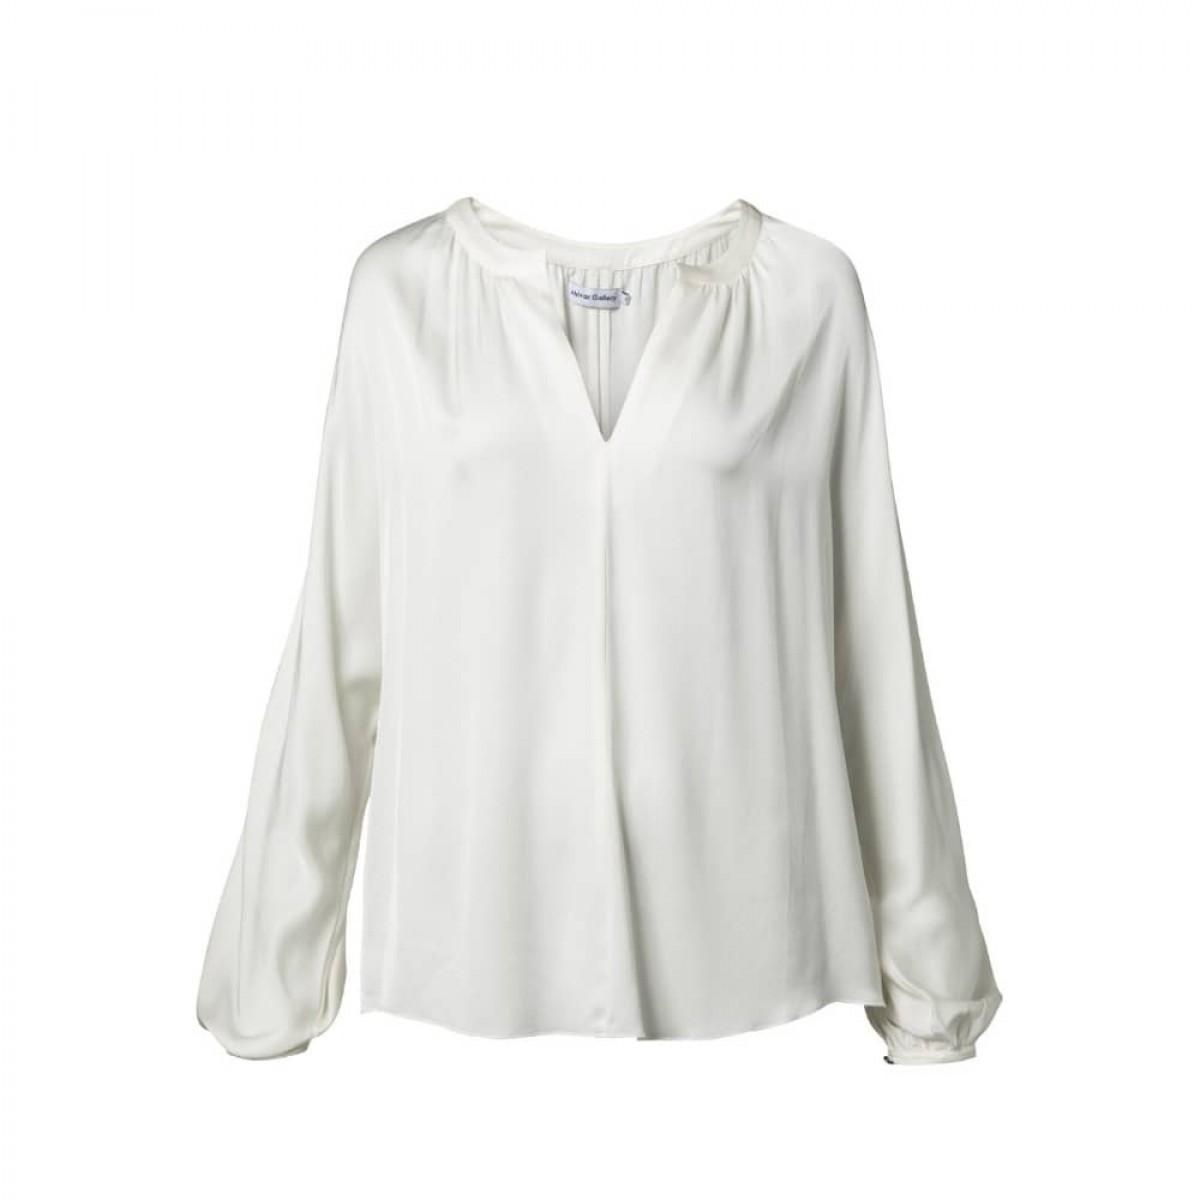 hiromi bluse - off white - detalje billede